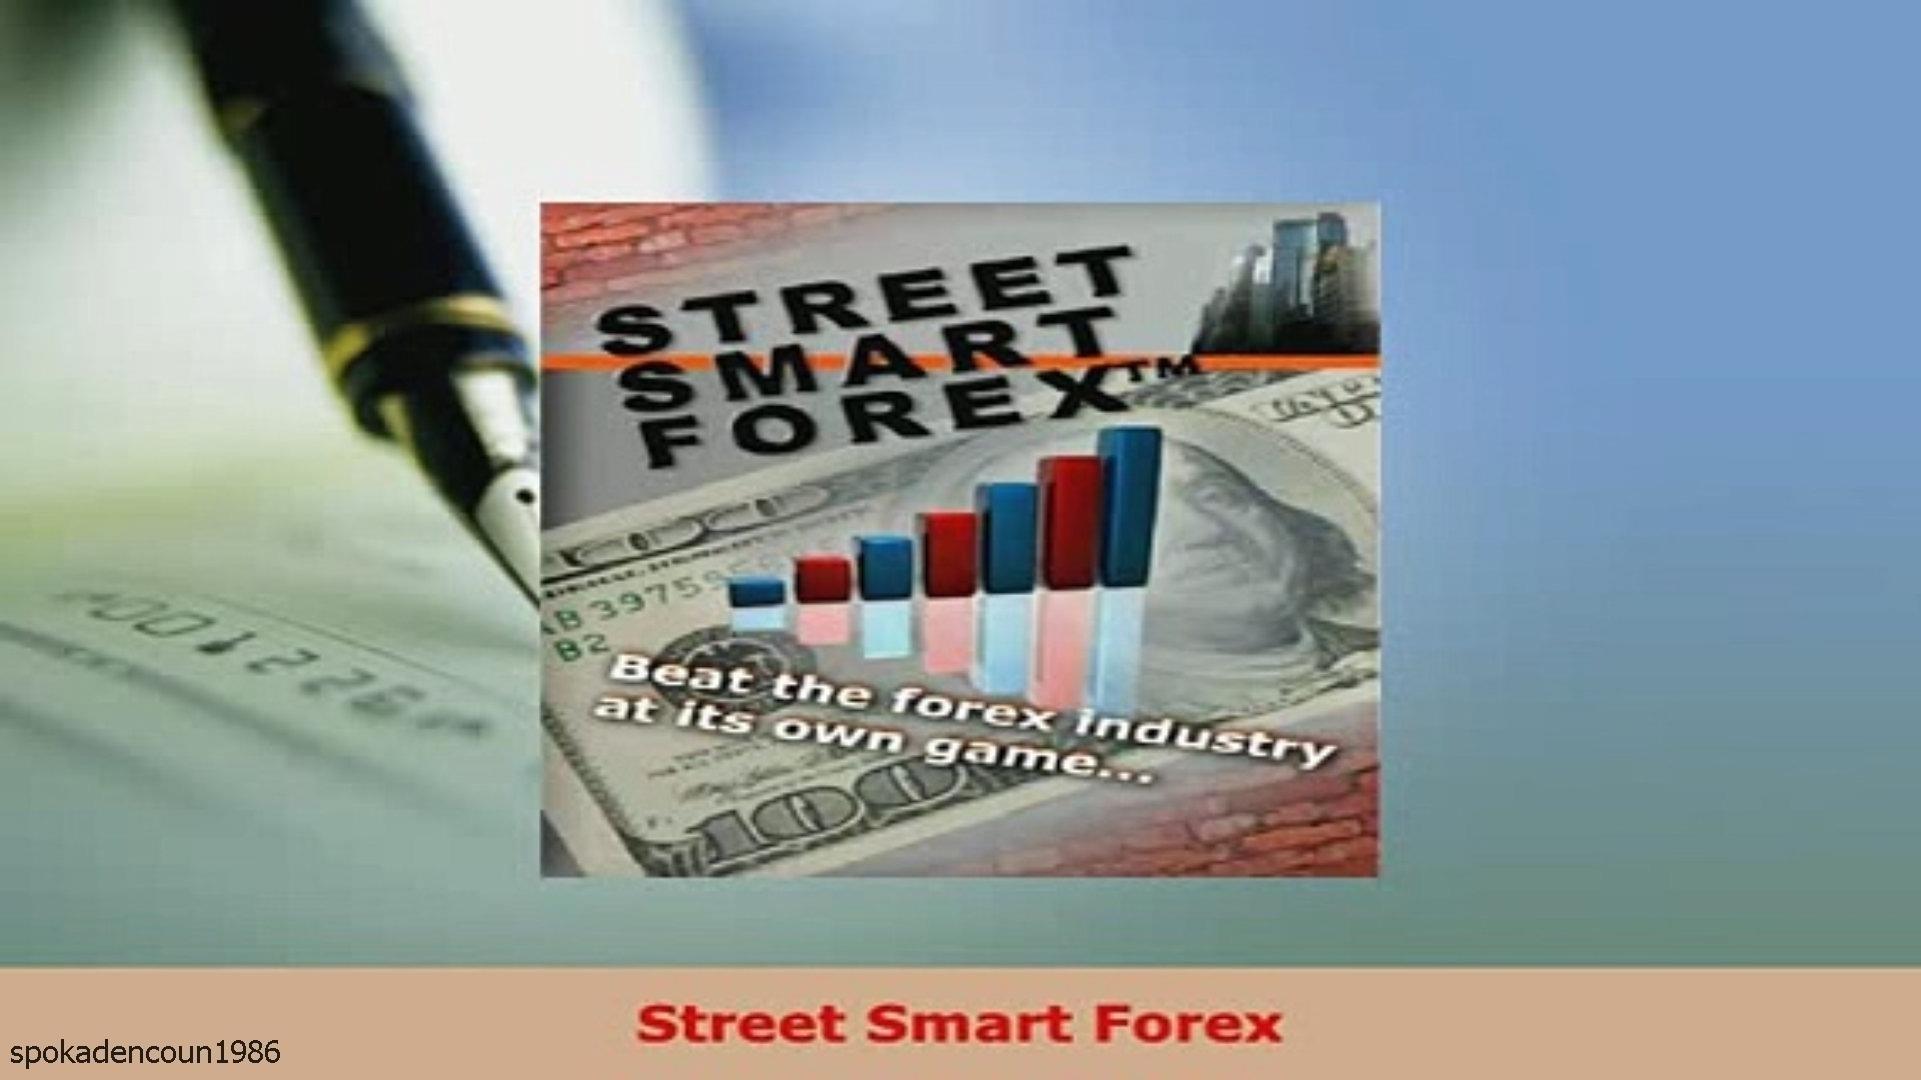 Street Smart Forex Exe 2019 Ver 5 6 Update